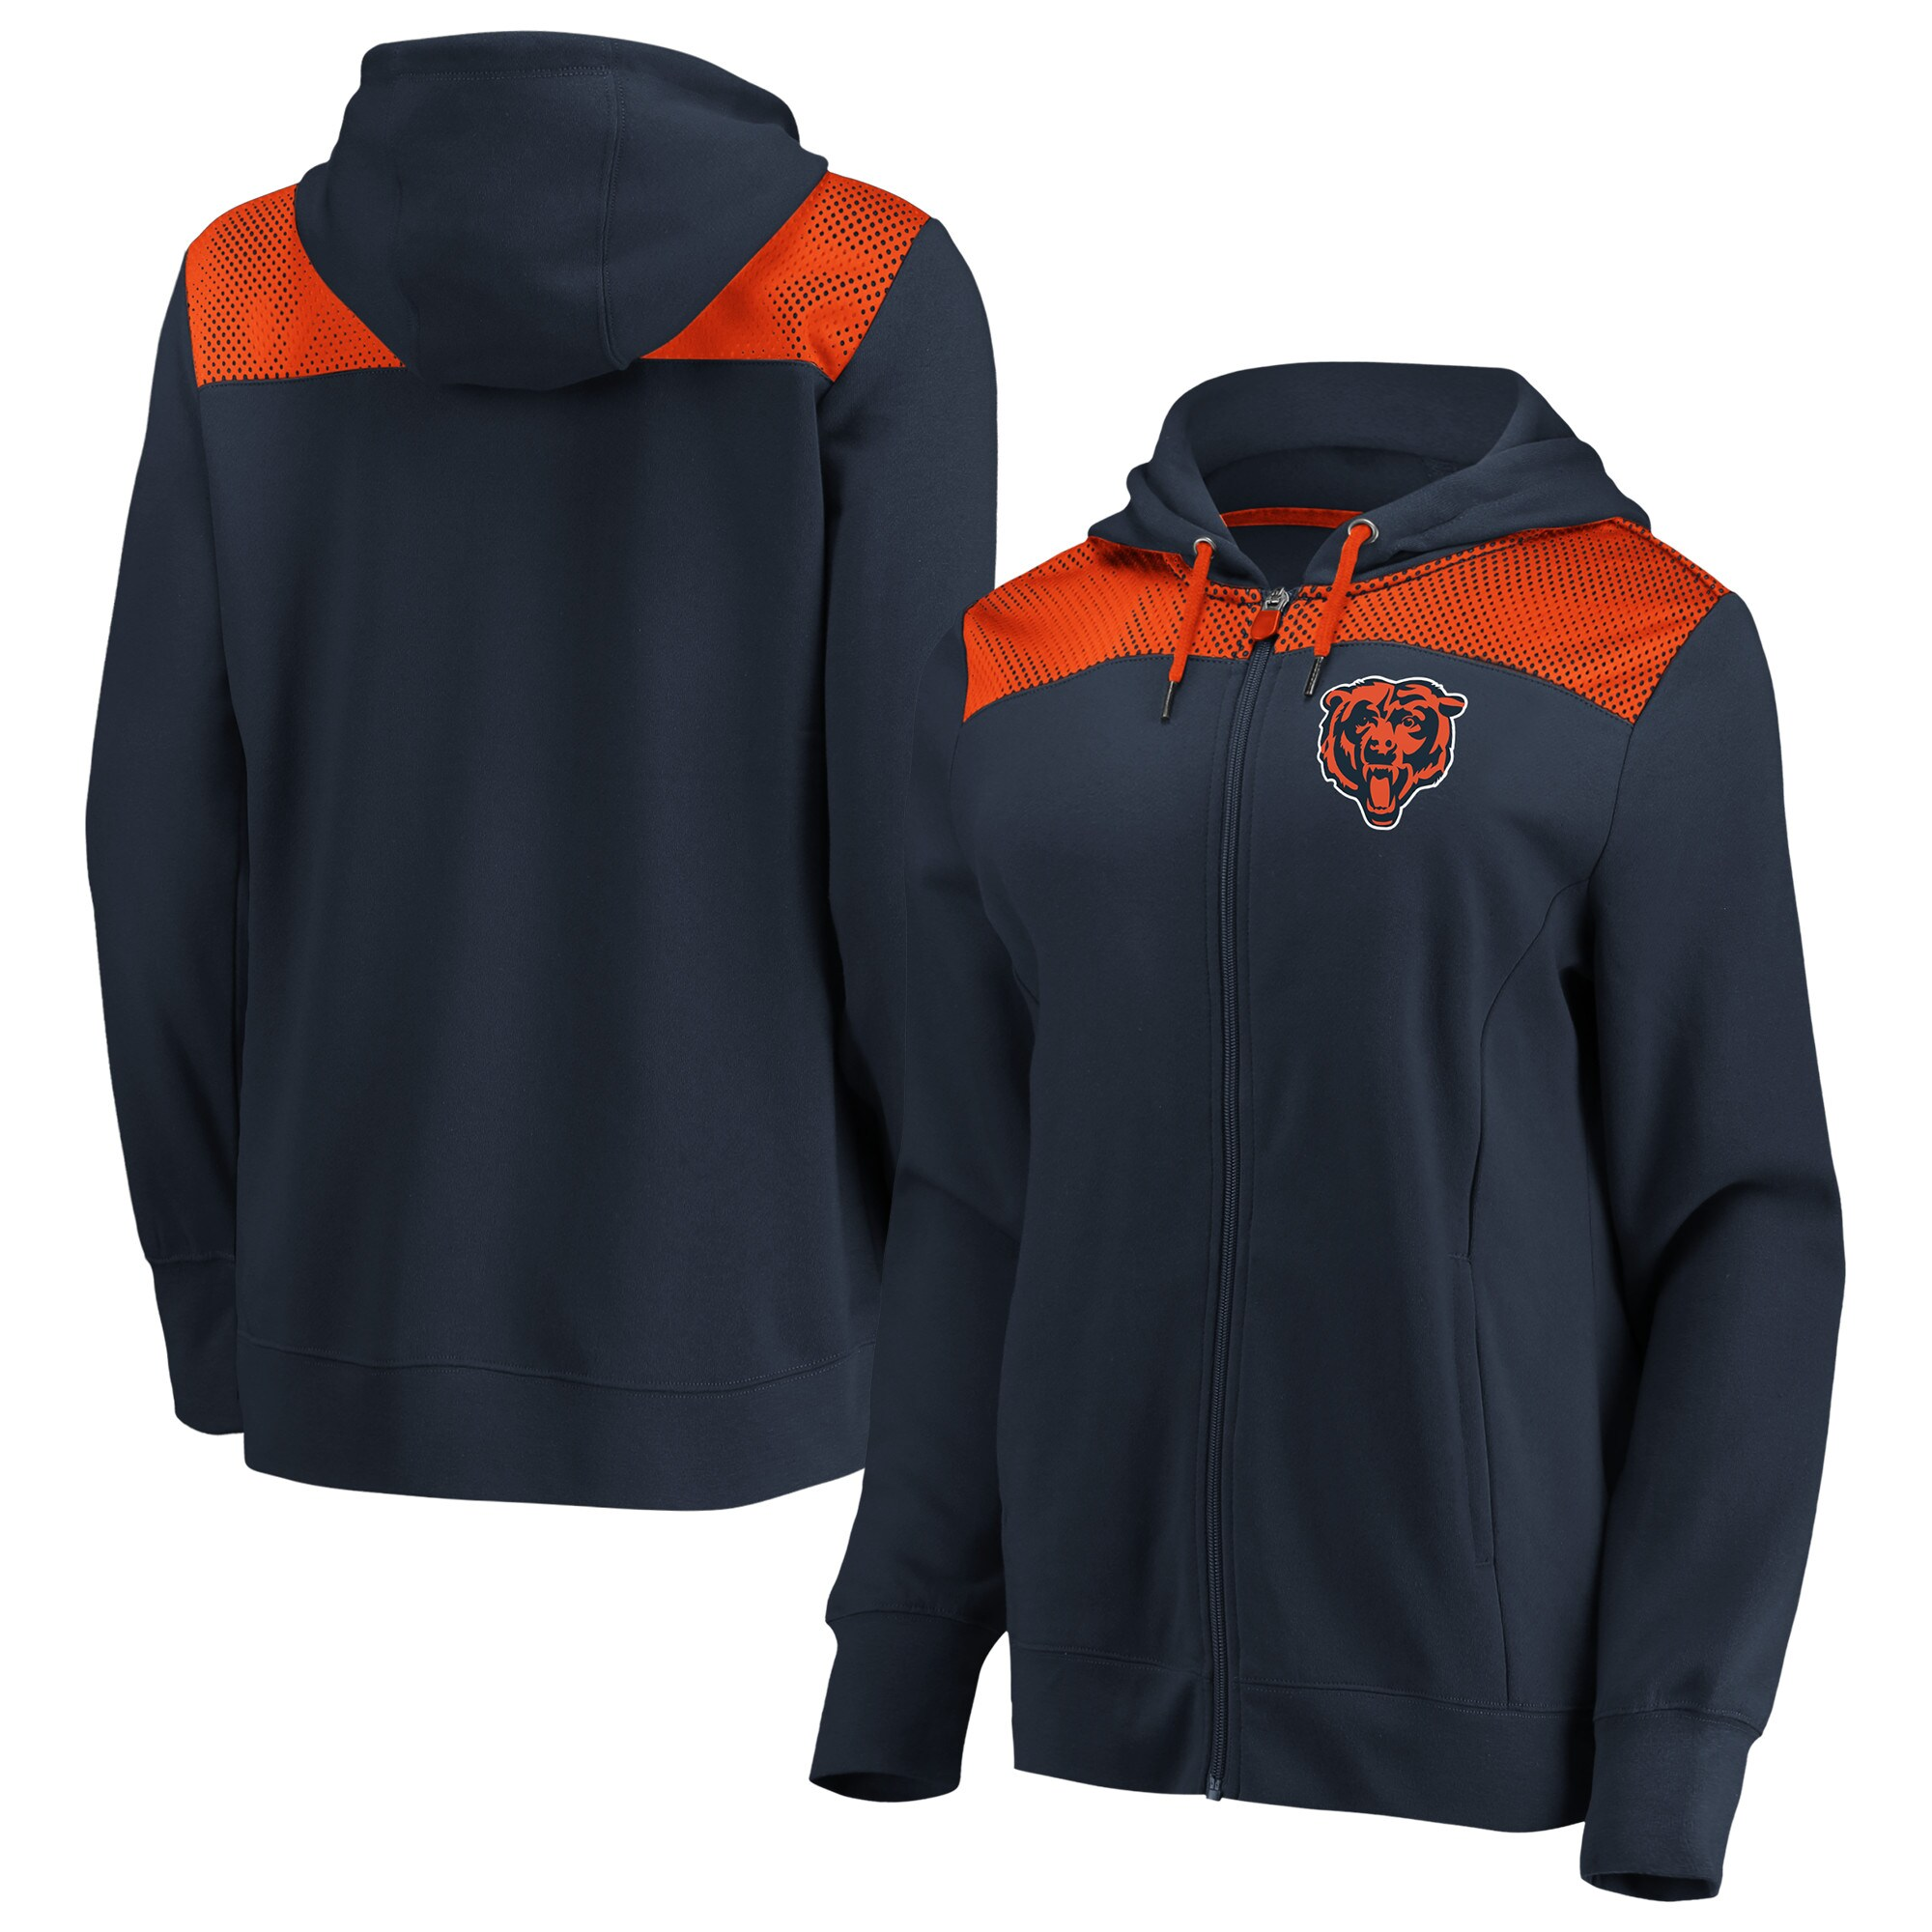 Chicago Bears Fanatics Branded Women's Team Best Full-Zip Hoodie - Navy